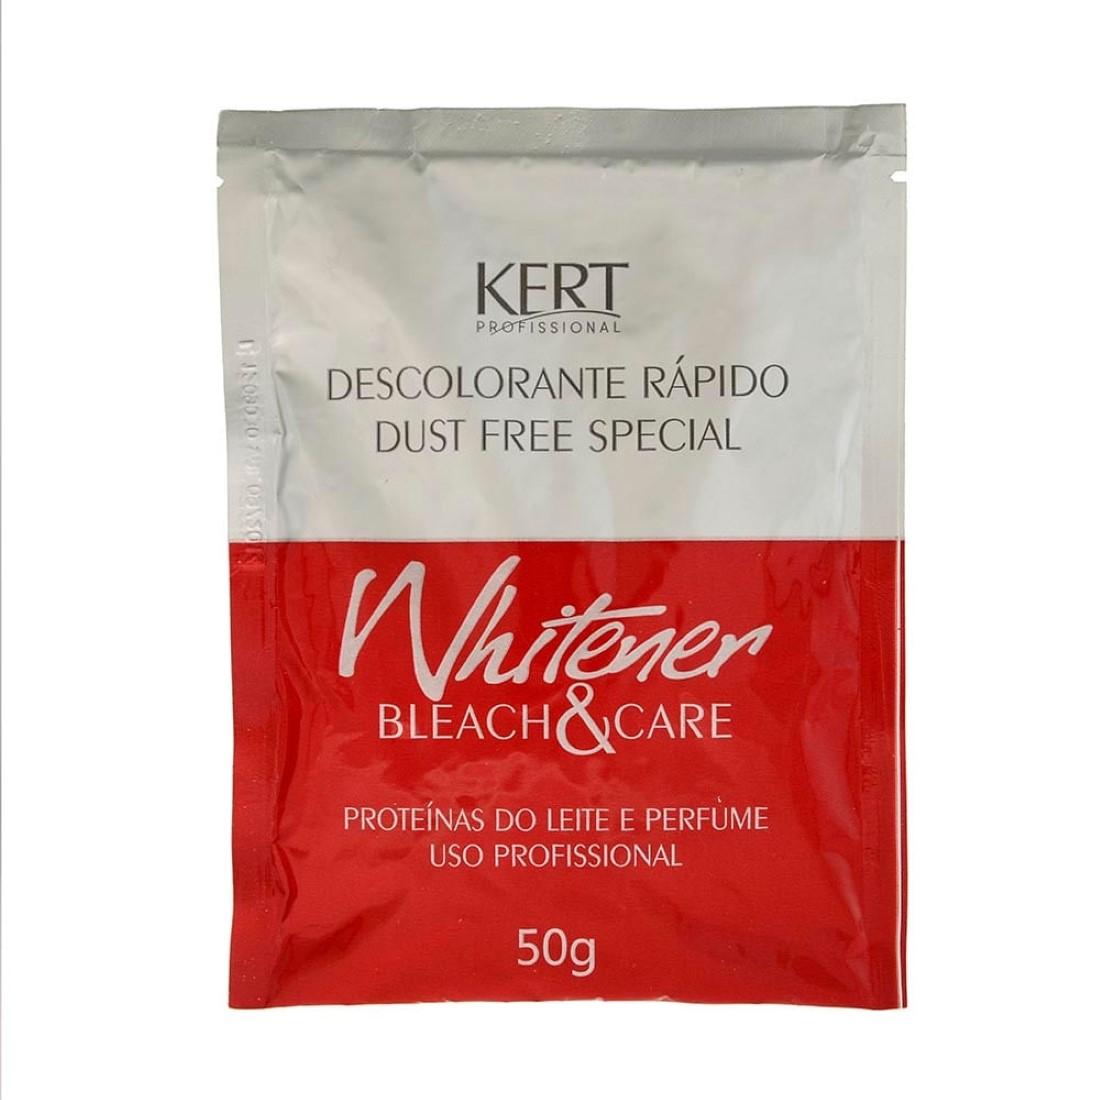 Pó Descolorante Whitener Bleach & Care 50g - Kert